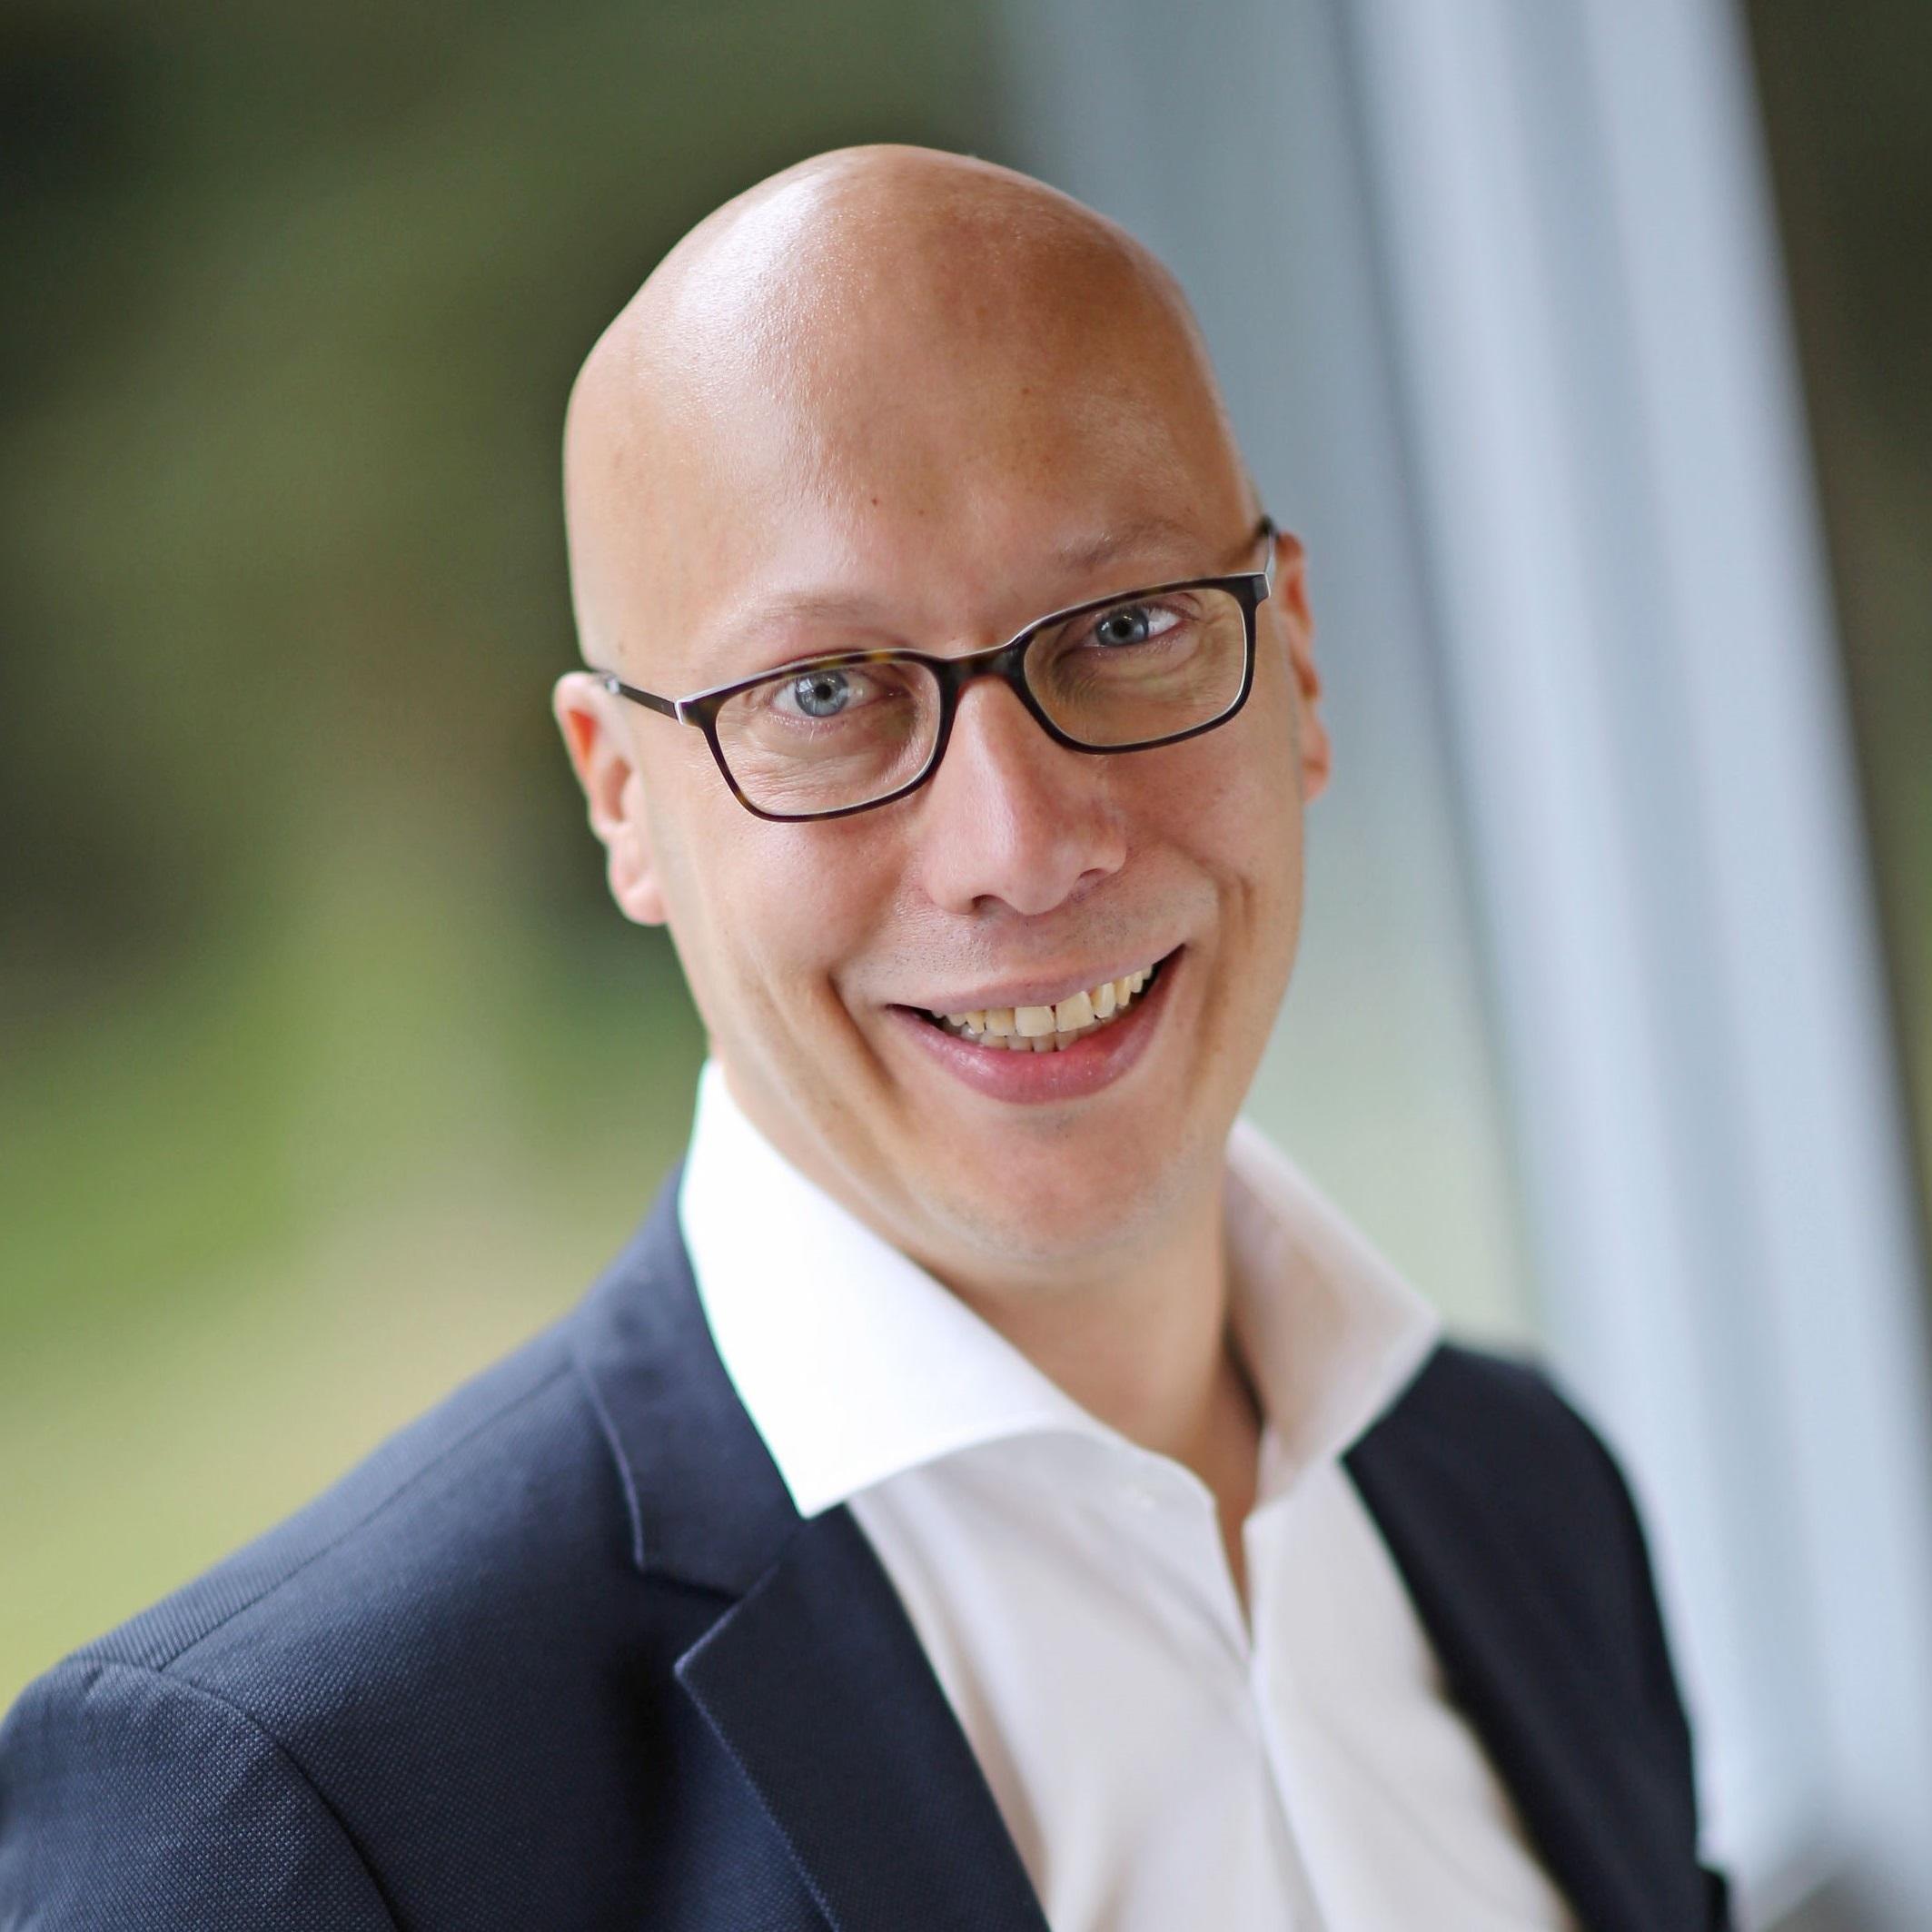 Oikos Bastiaan van der Linden